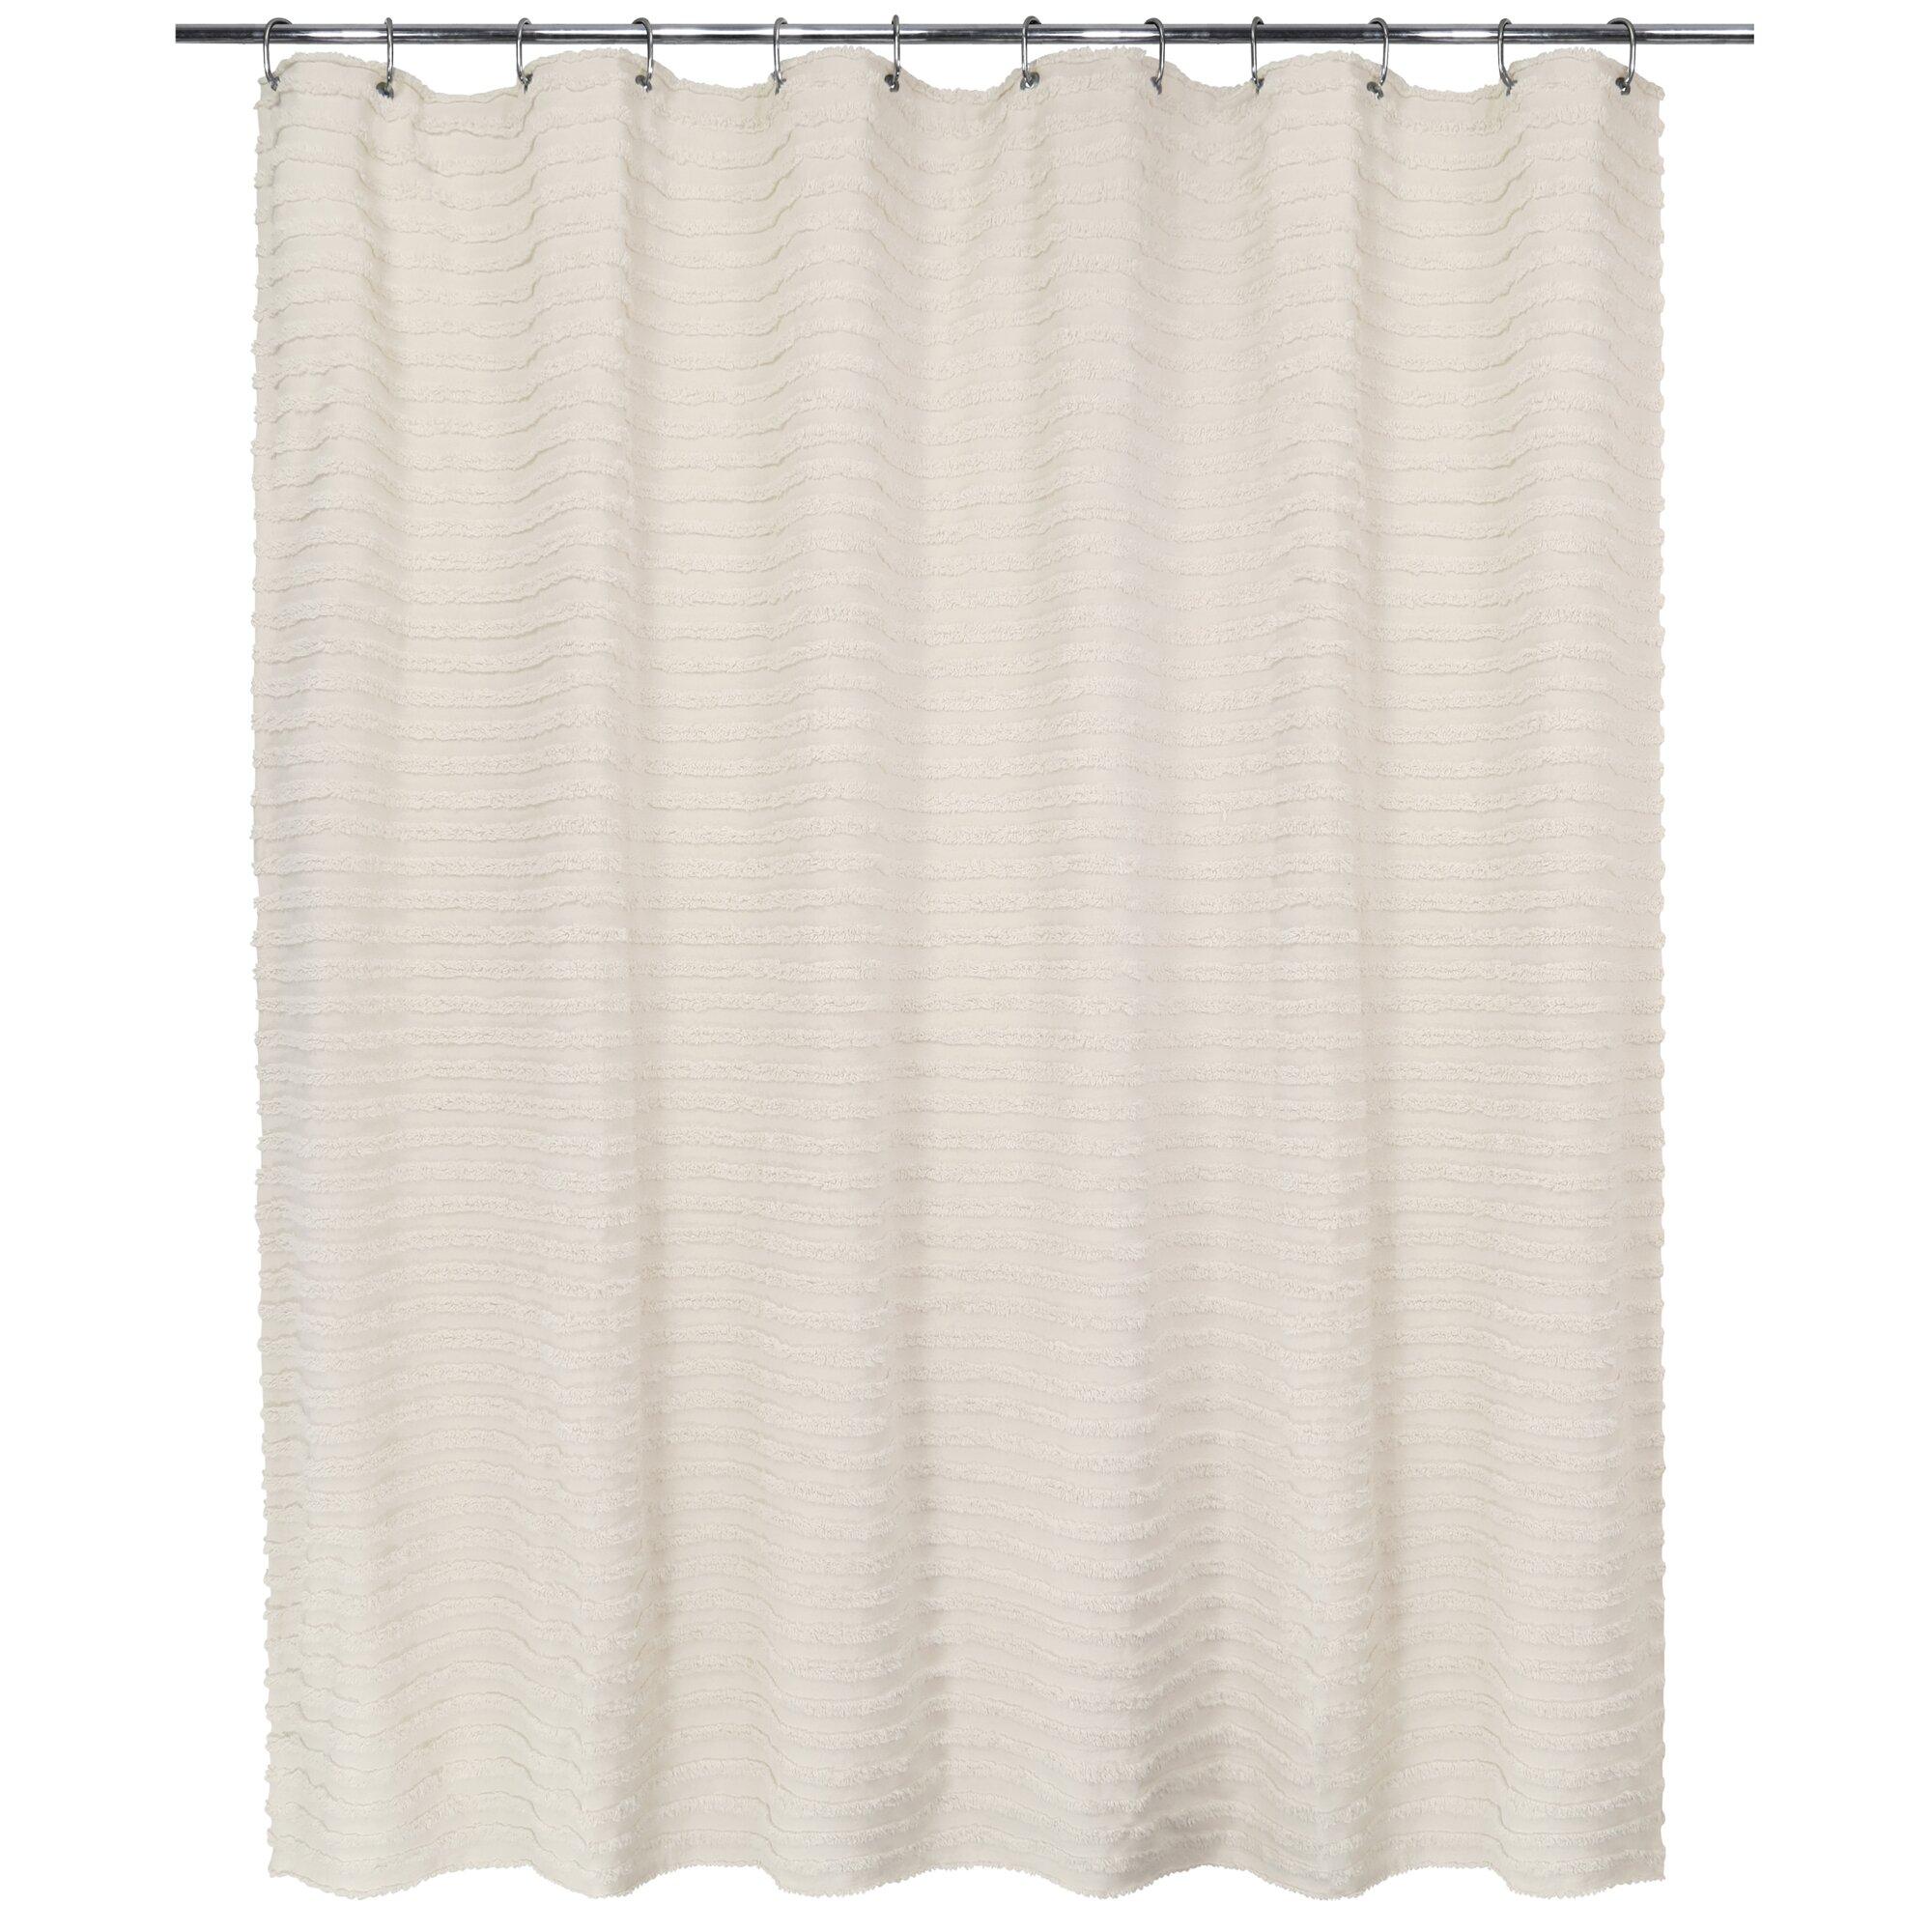 Park B Smith Ltd 100% Cotton Ultra Spa Shower Curtain